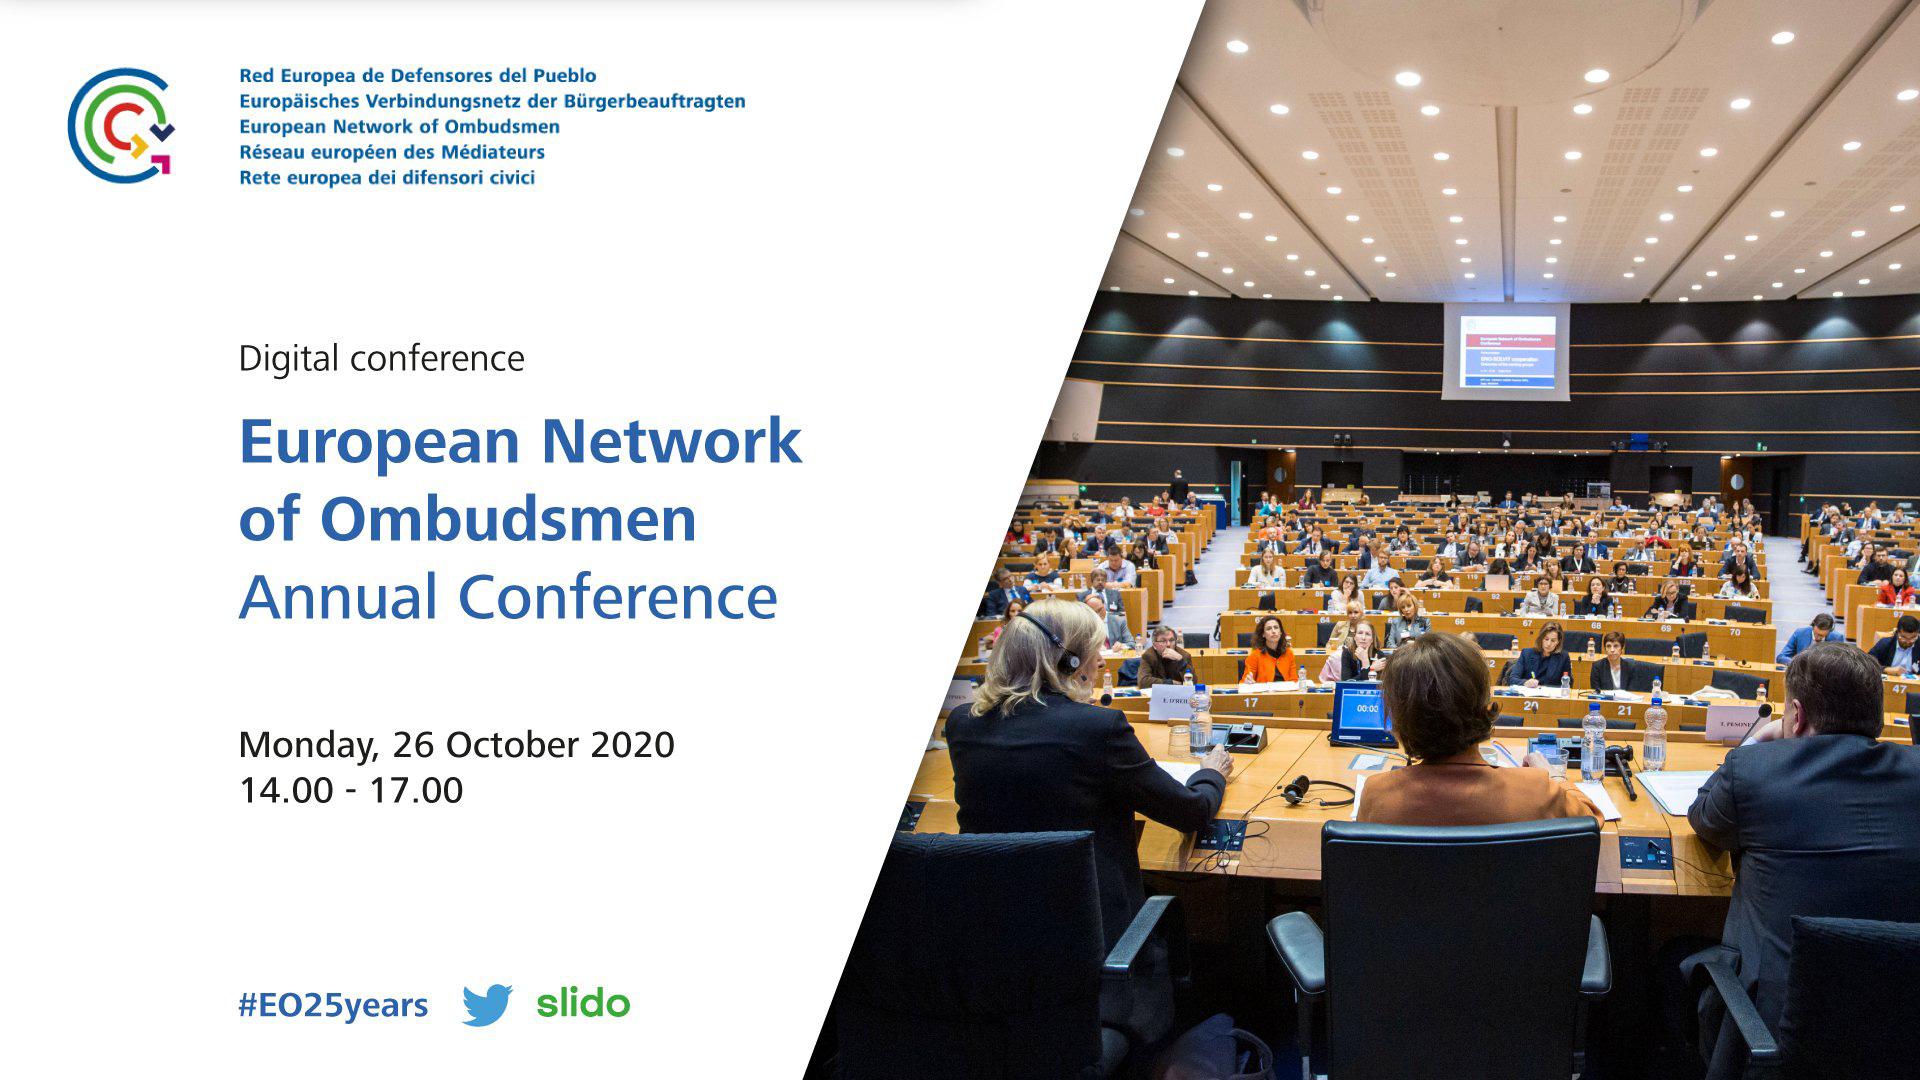 Euroopa ombudsmanide võrgustik